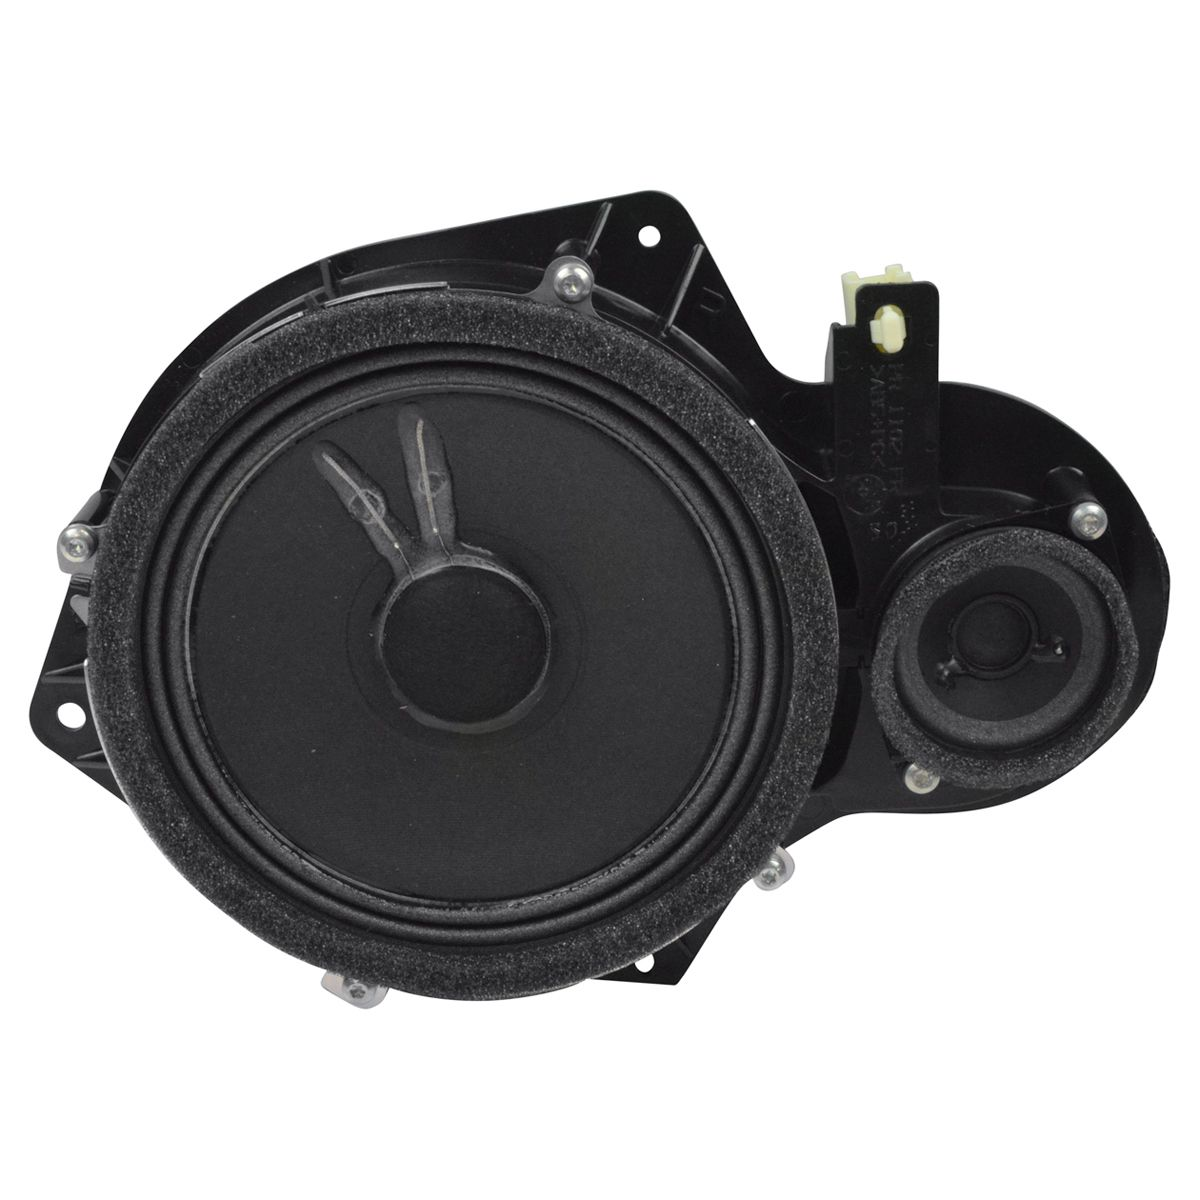 Details about OEM 86160-AF060 JBL Door Speaker RH Right Front Lower for  Toyota Sequoia Tundra